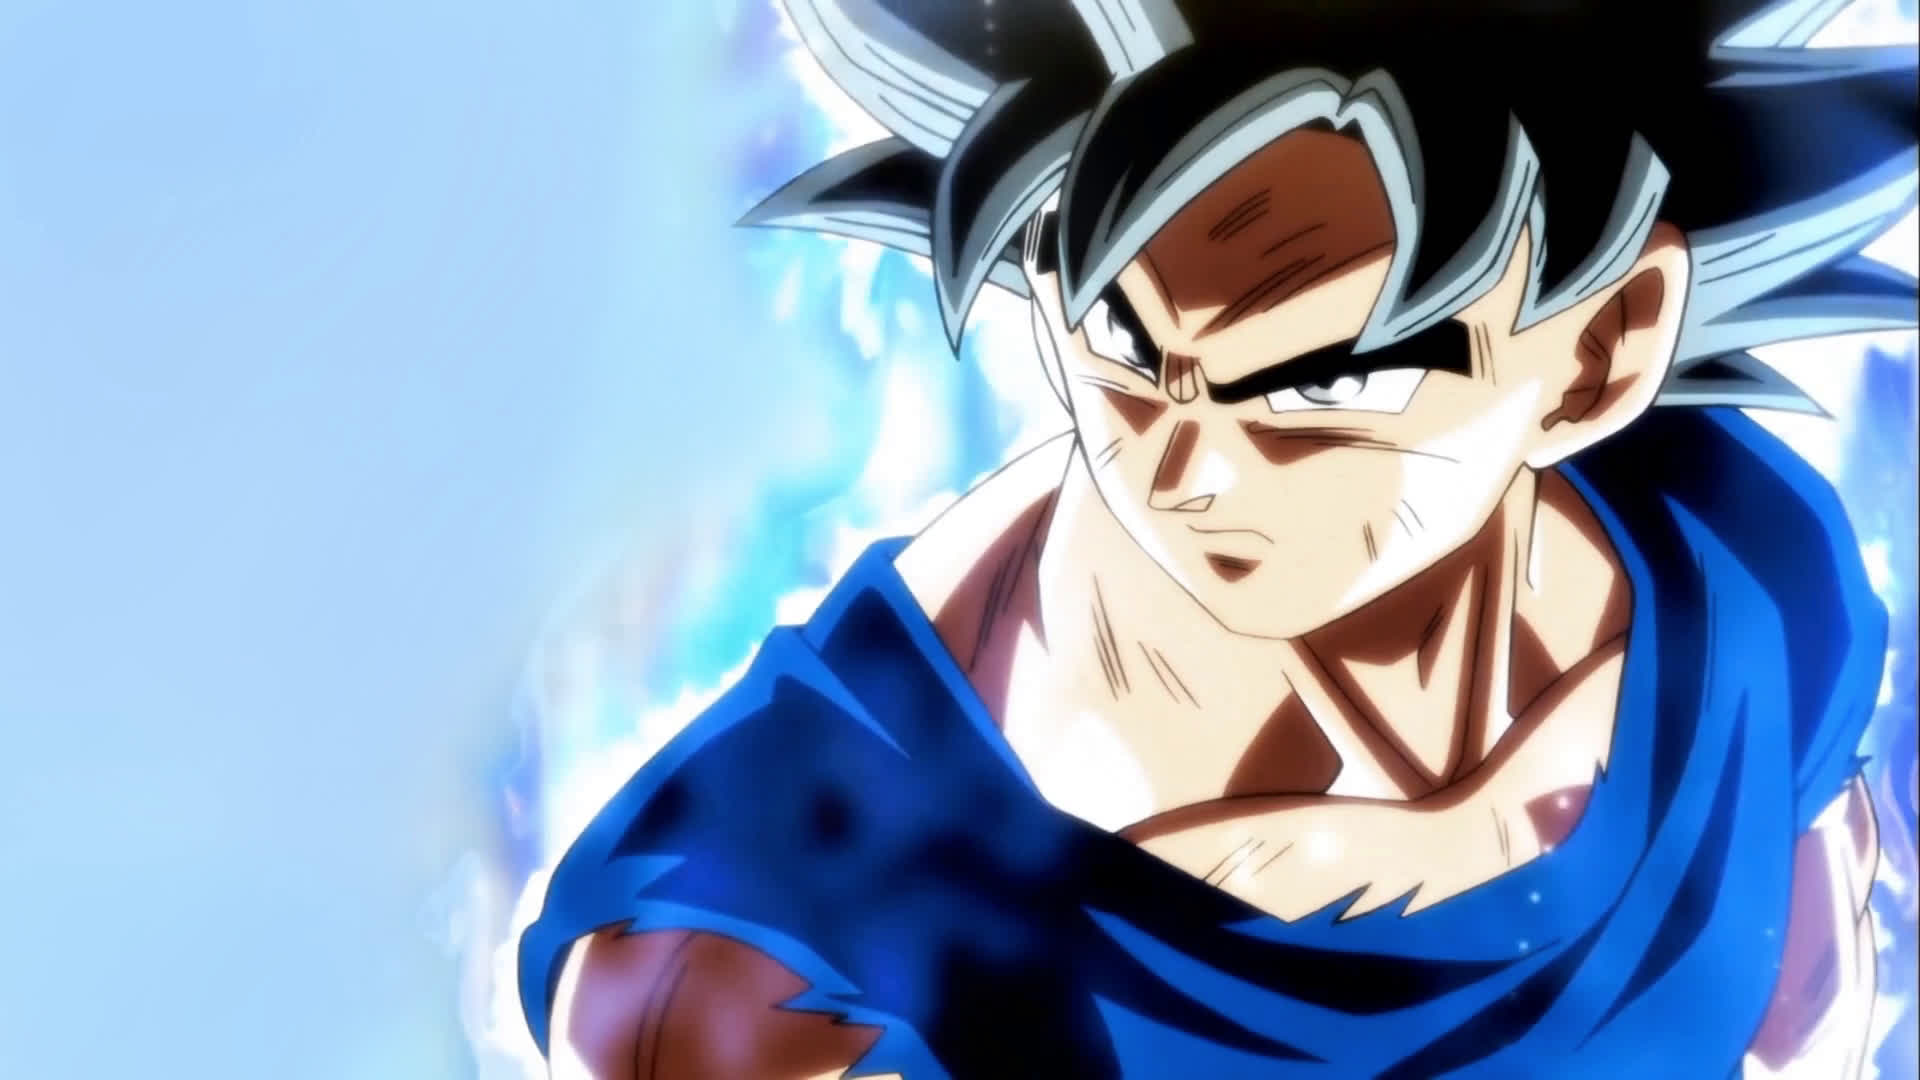 V 1 Dragon Ball S Goku Ultra Instinct Live Wallpaper Embed